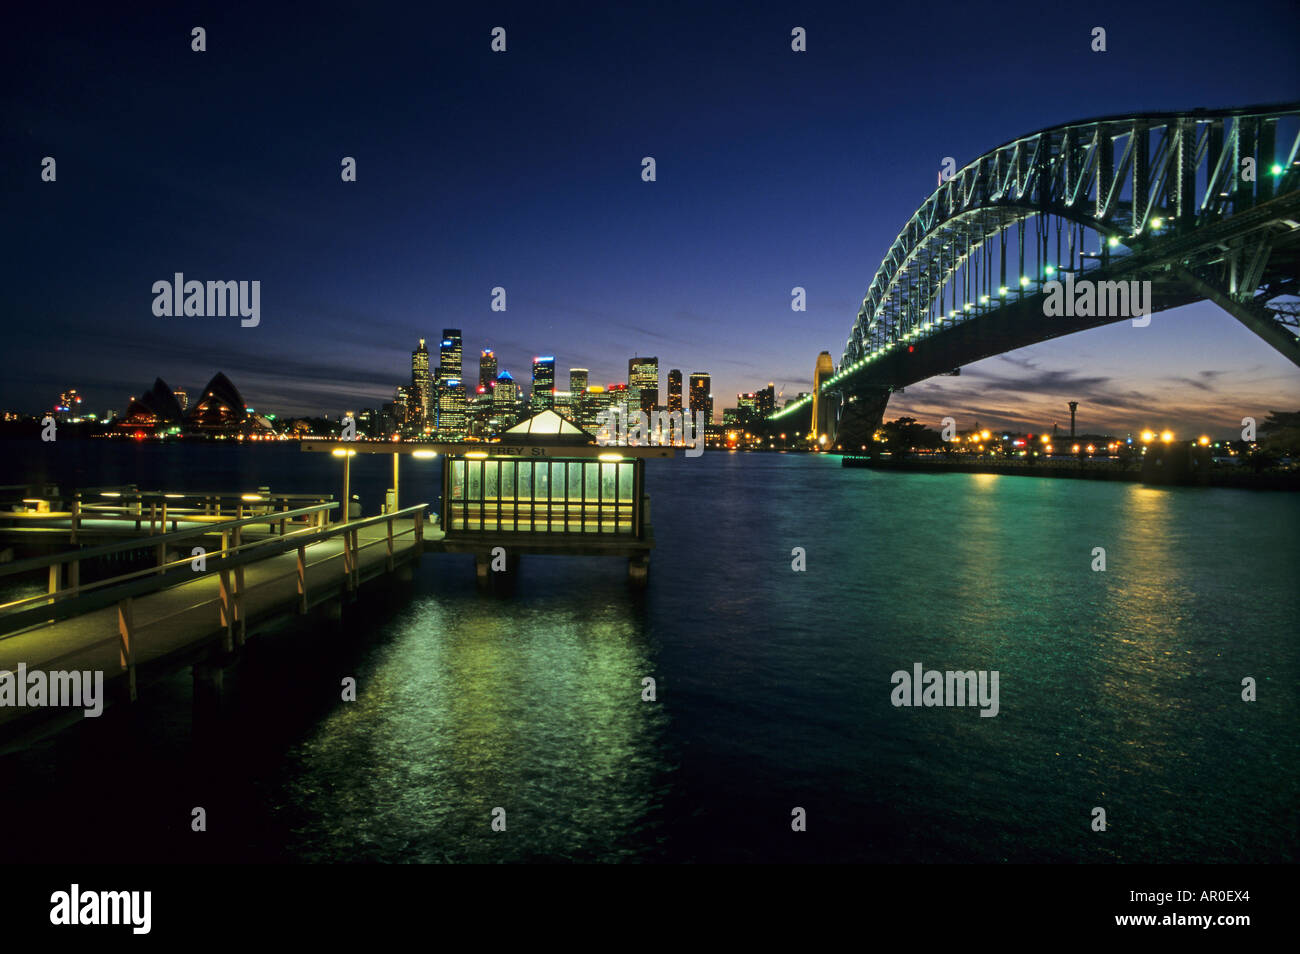 Sydney Harbour Bridge, at sundown. Jeffrey Street Wharf, North Shore, Australia - Stock Image